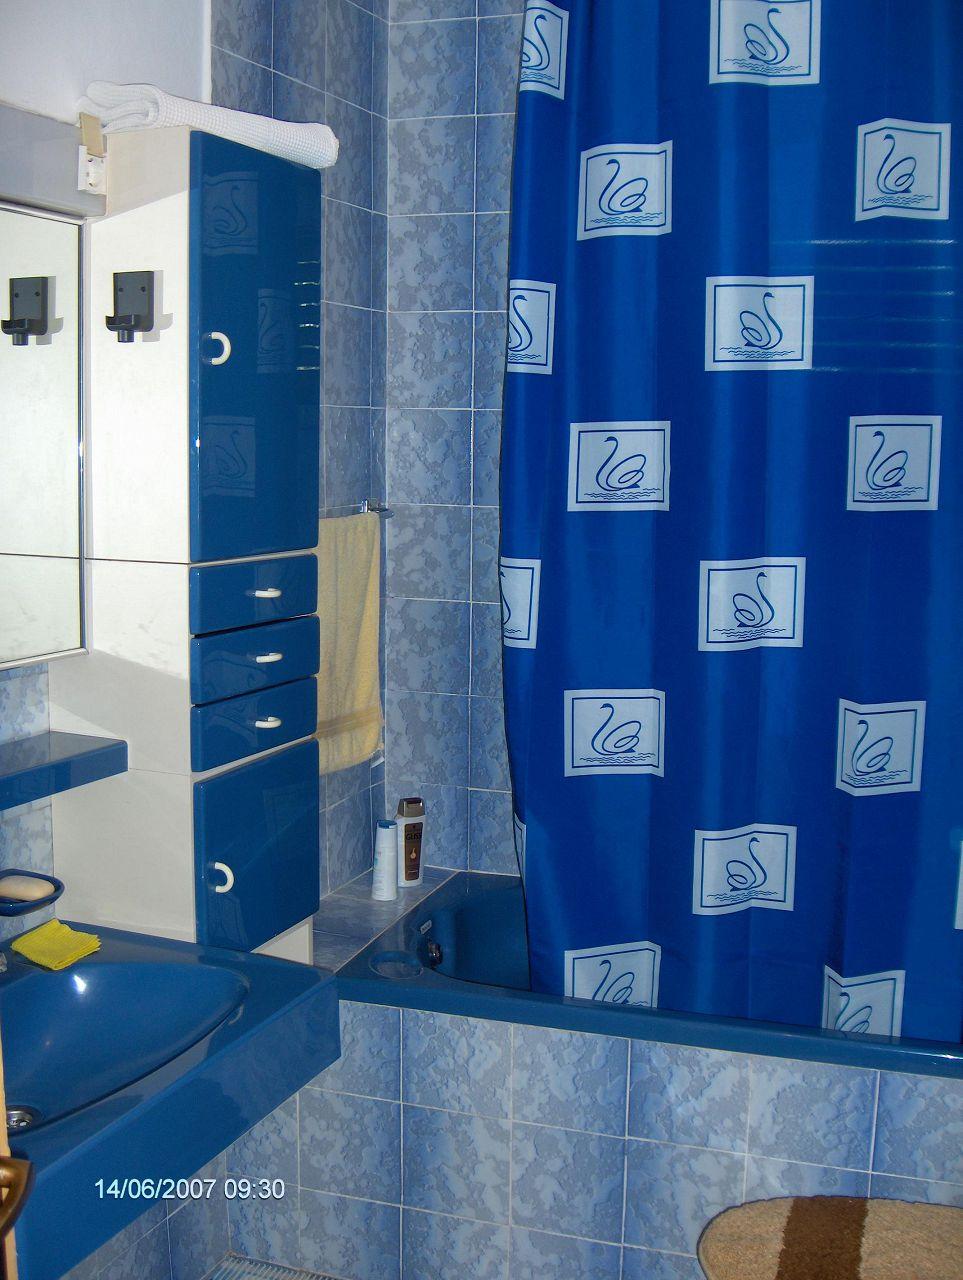 0203VRBO - Vrboska - Appartementen Kroatië - R2(2): badkamer met toilet